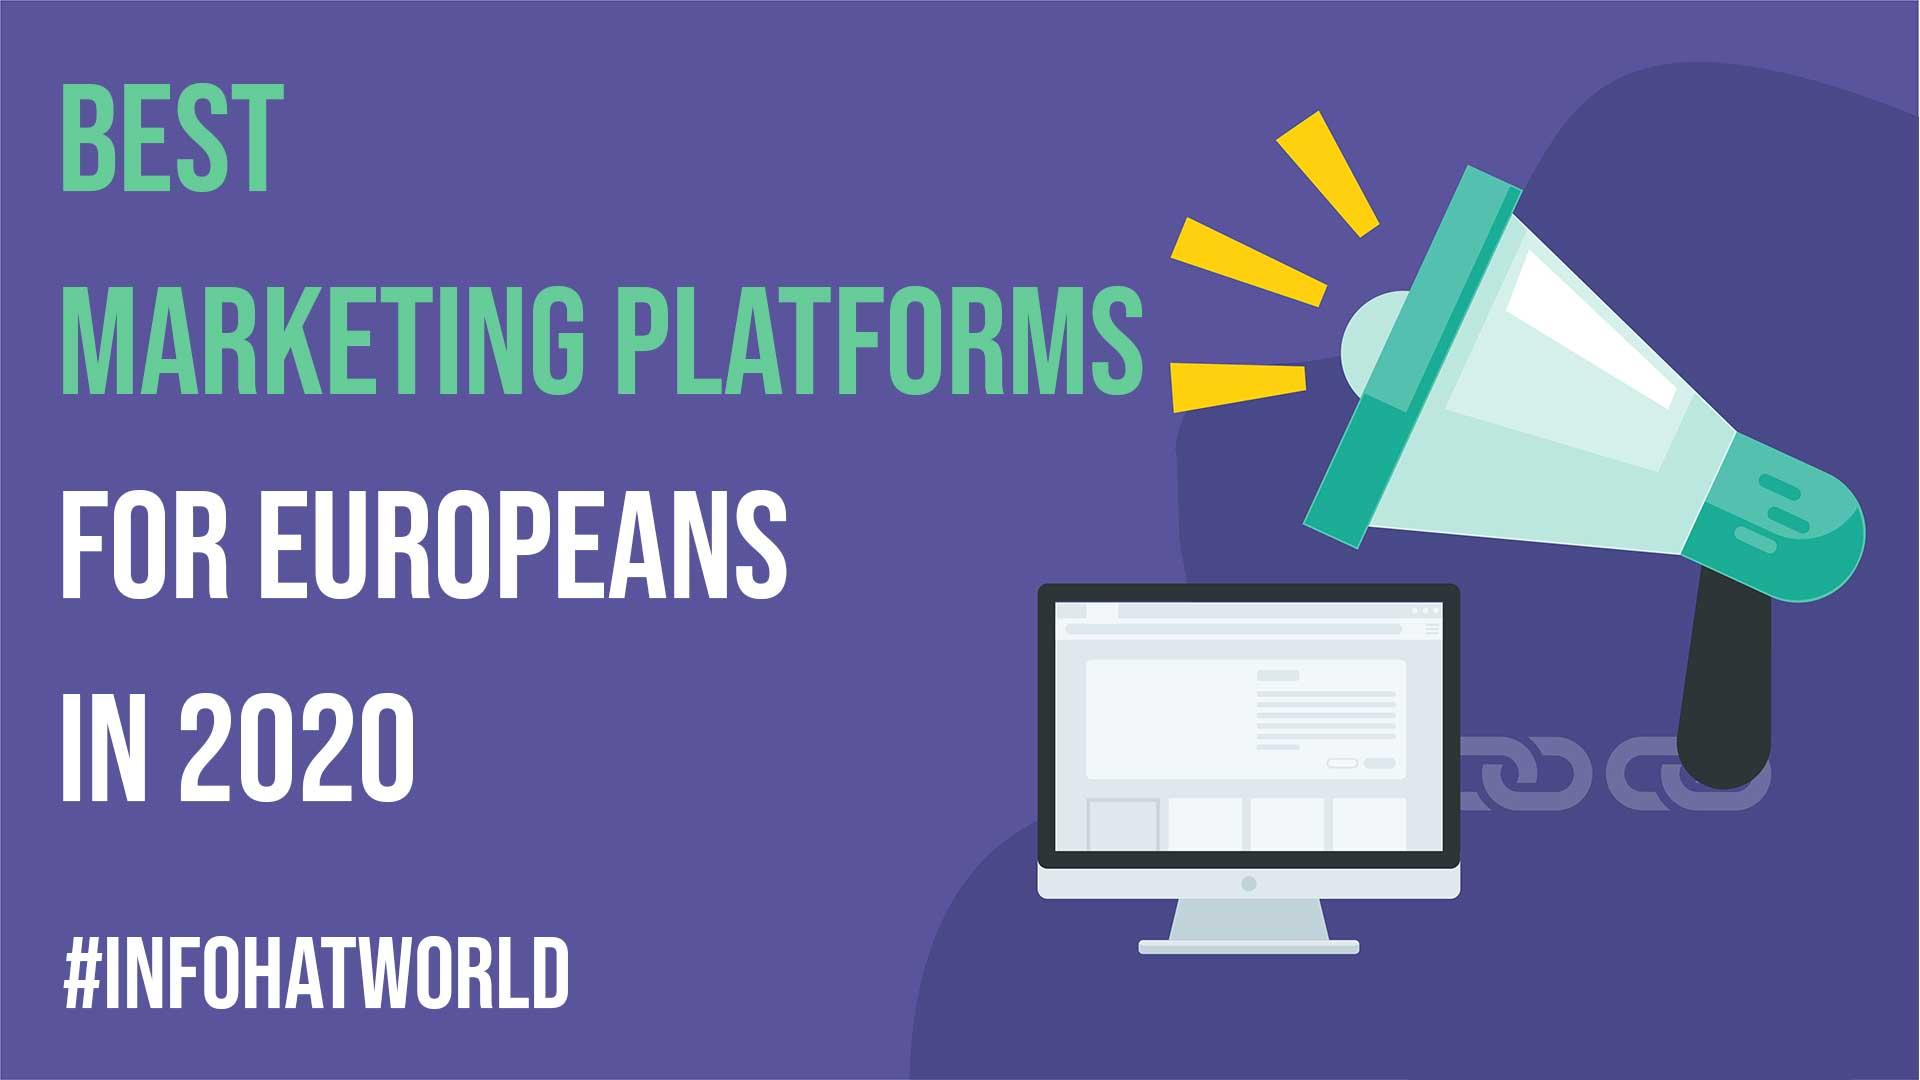 Best Marketing Platforms for Europeans in 2020